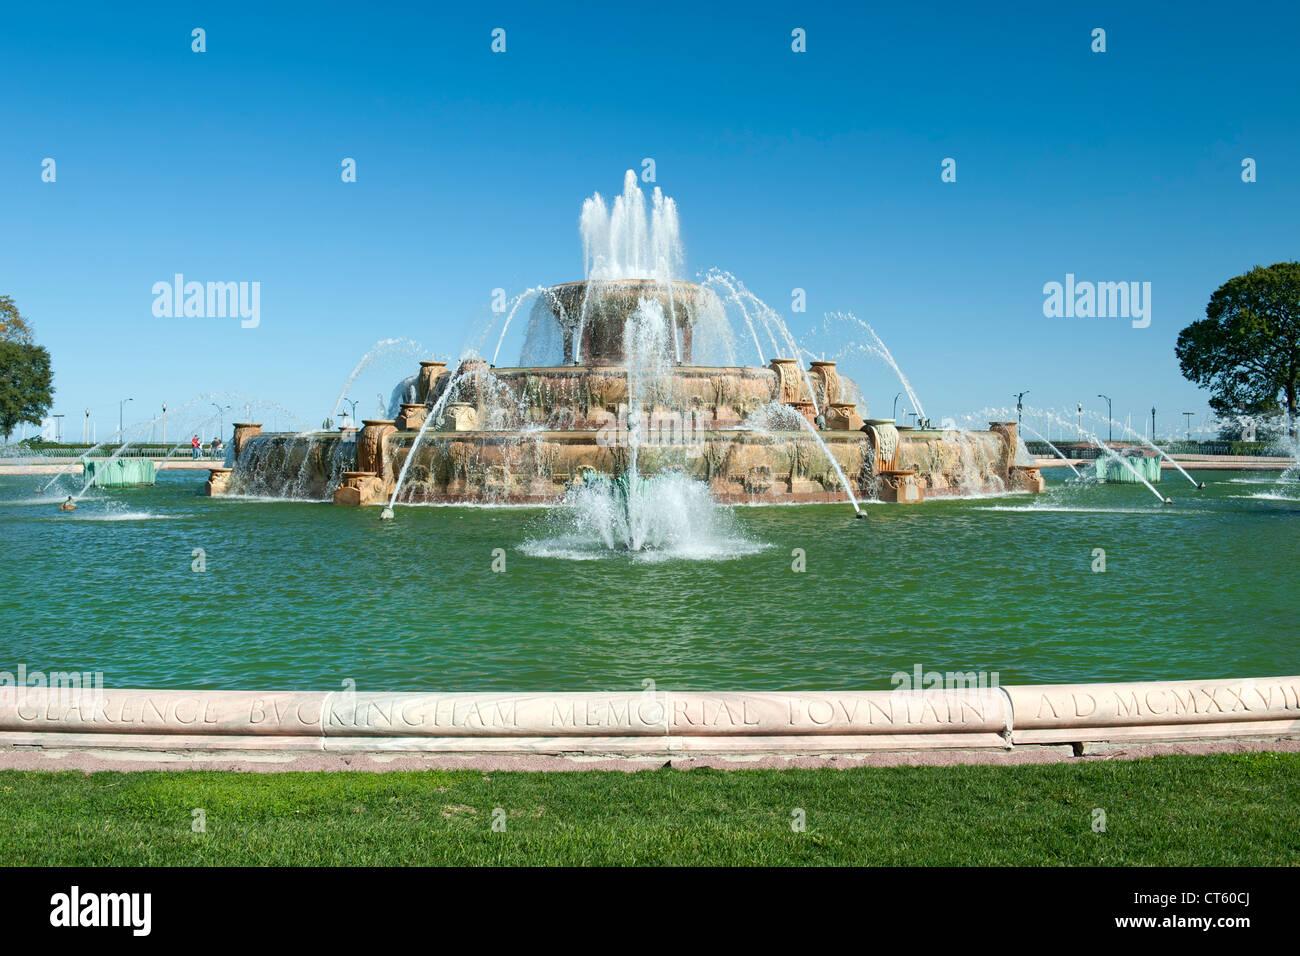 Buckingham fountain in Grant Park in Chicago, Illinois, USA. - Stock Image